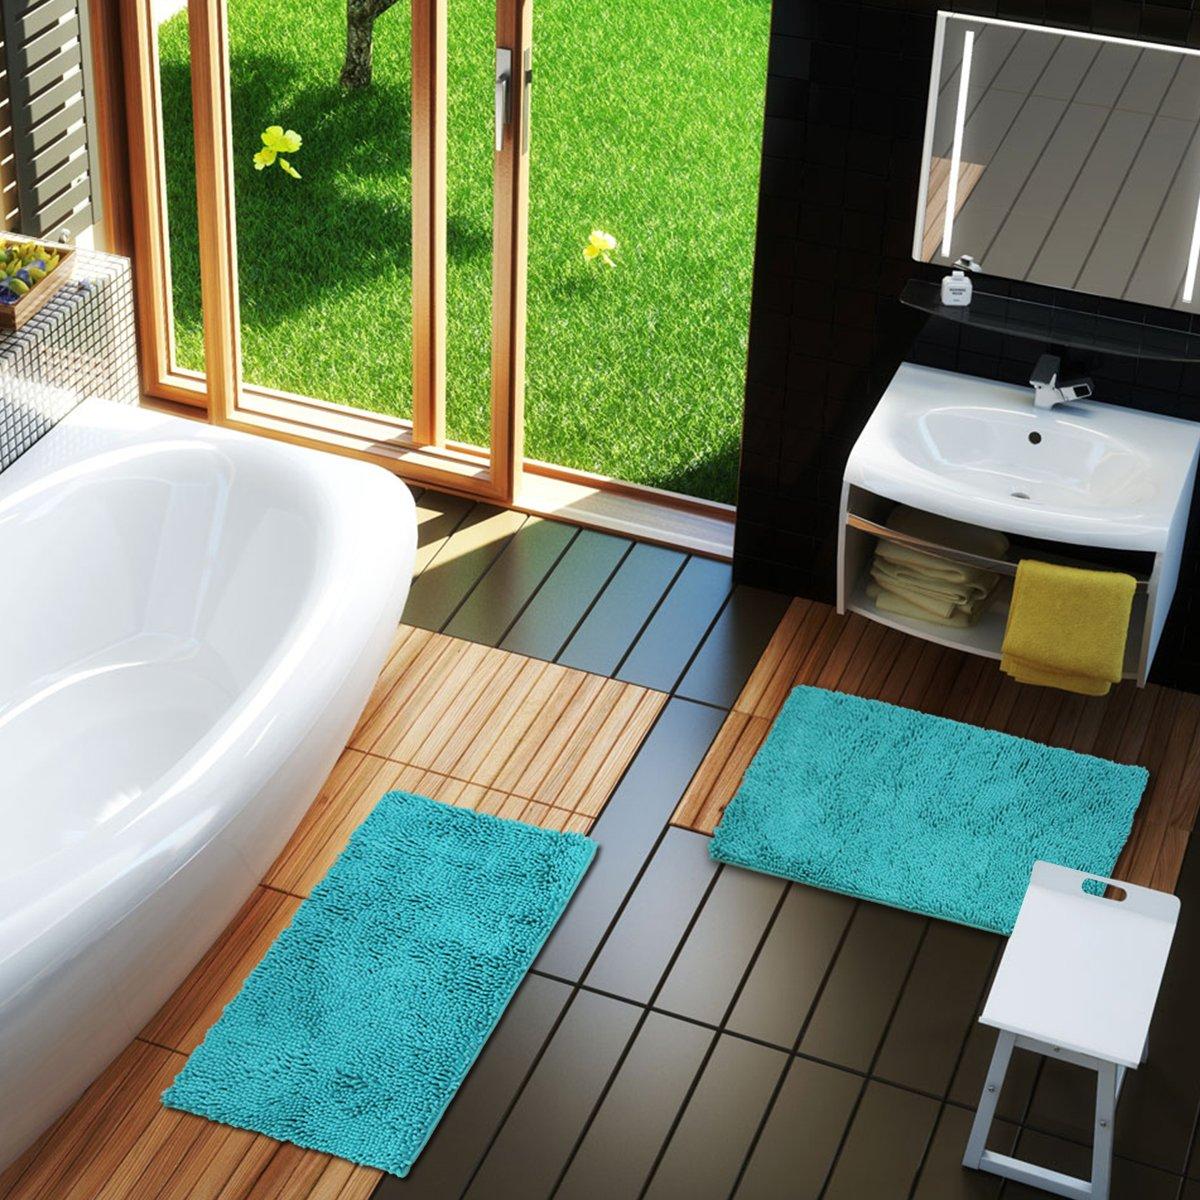 Mayshine Bath mats for Bathroom Rugs Non Slip Machine Washable Soft Microfiber 2 Pack (20×32 inches, Turquoise) by MAYSHINE (Image #4)